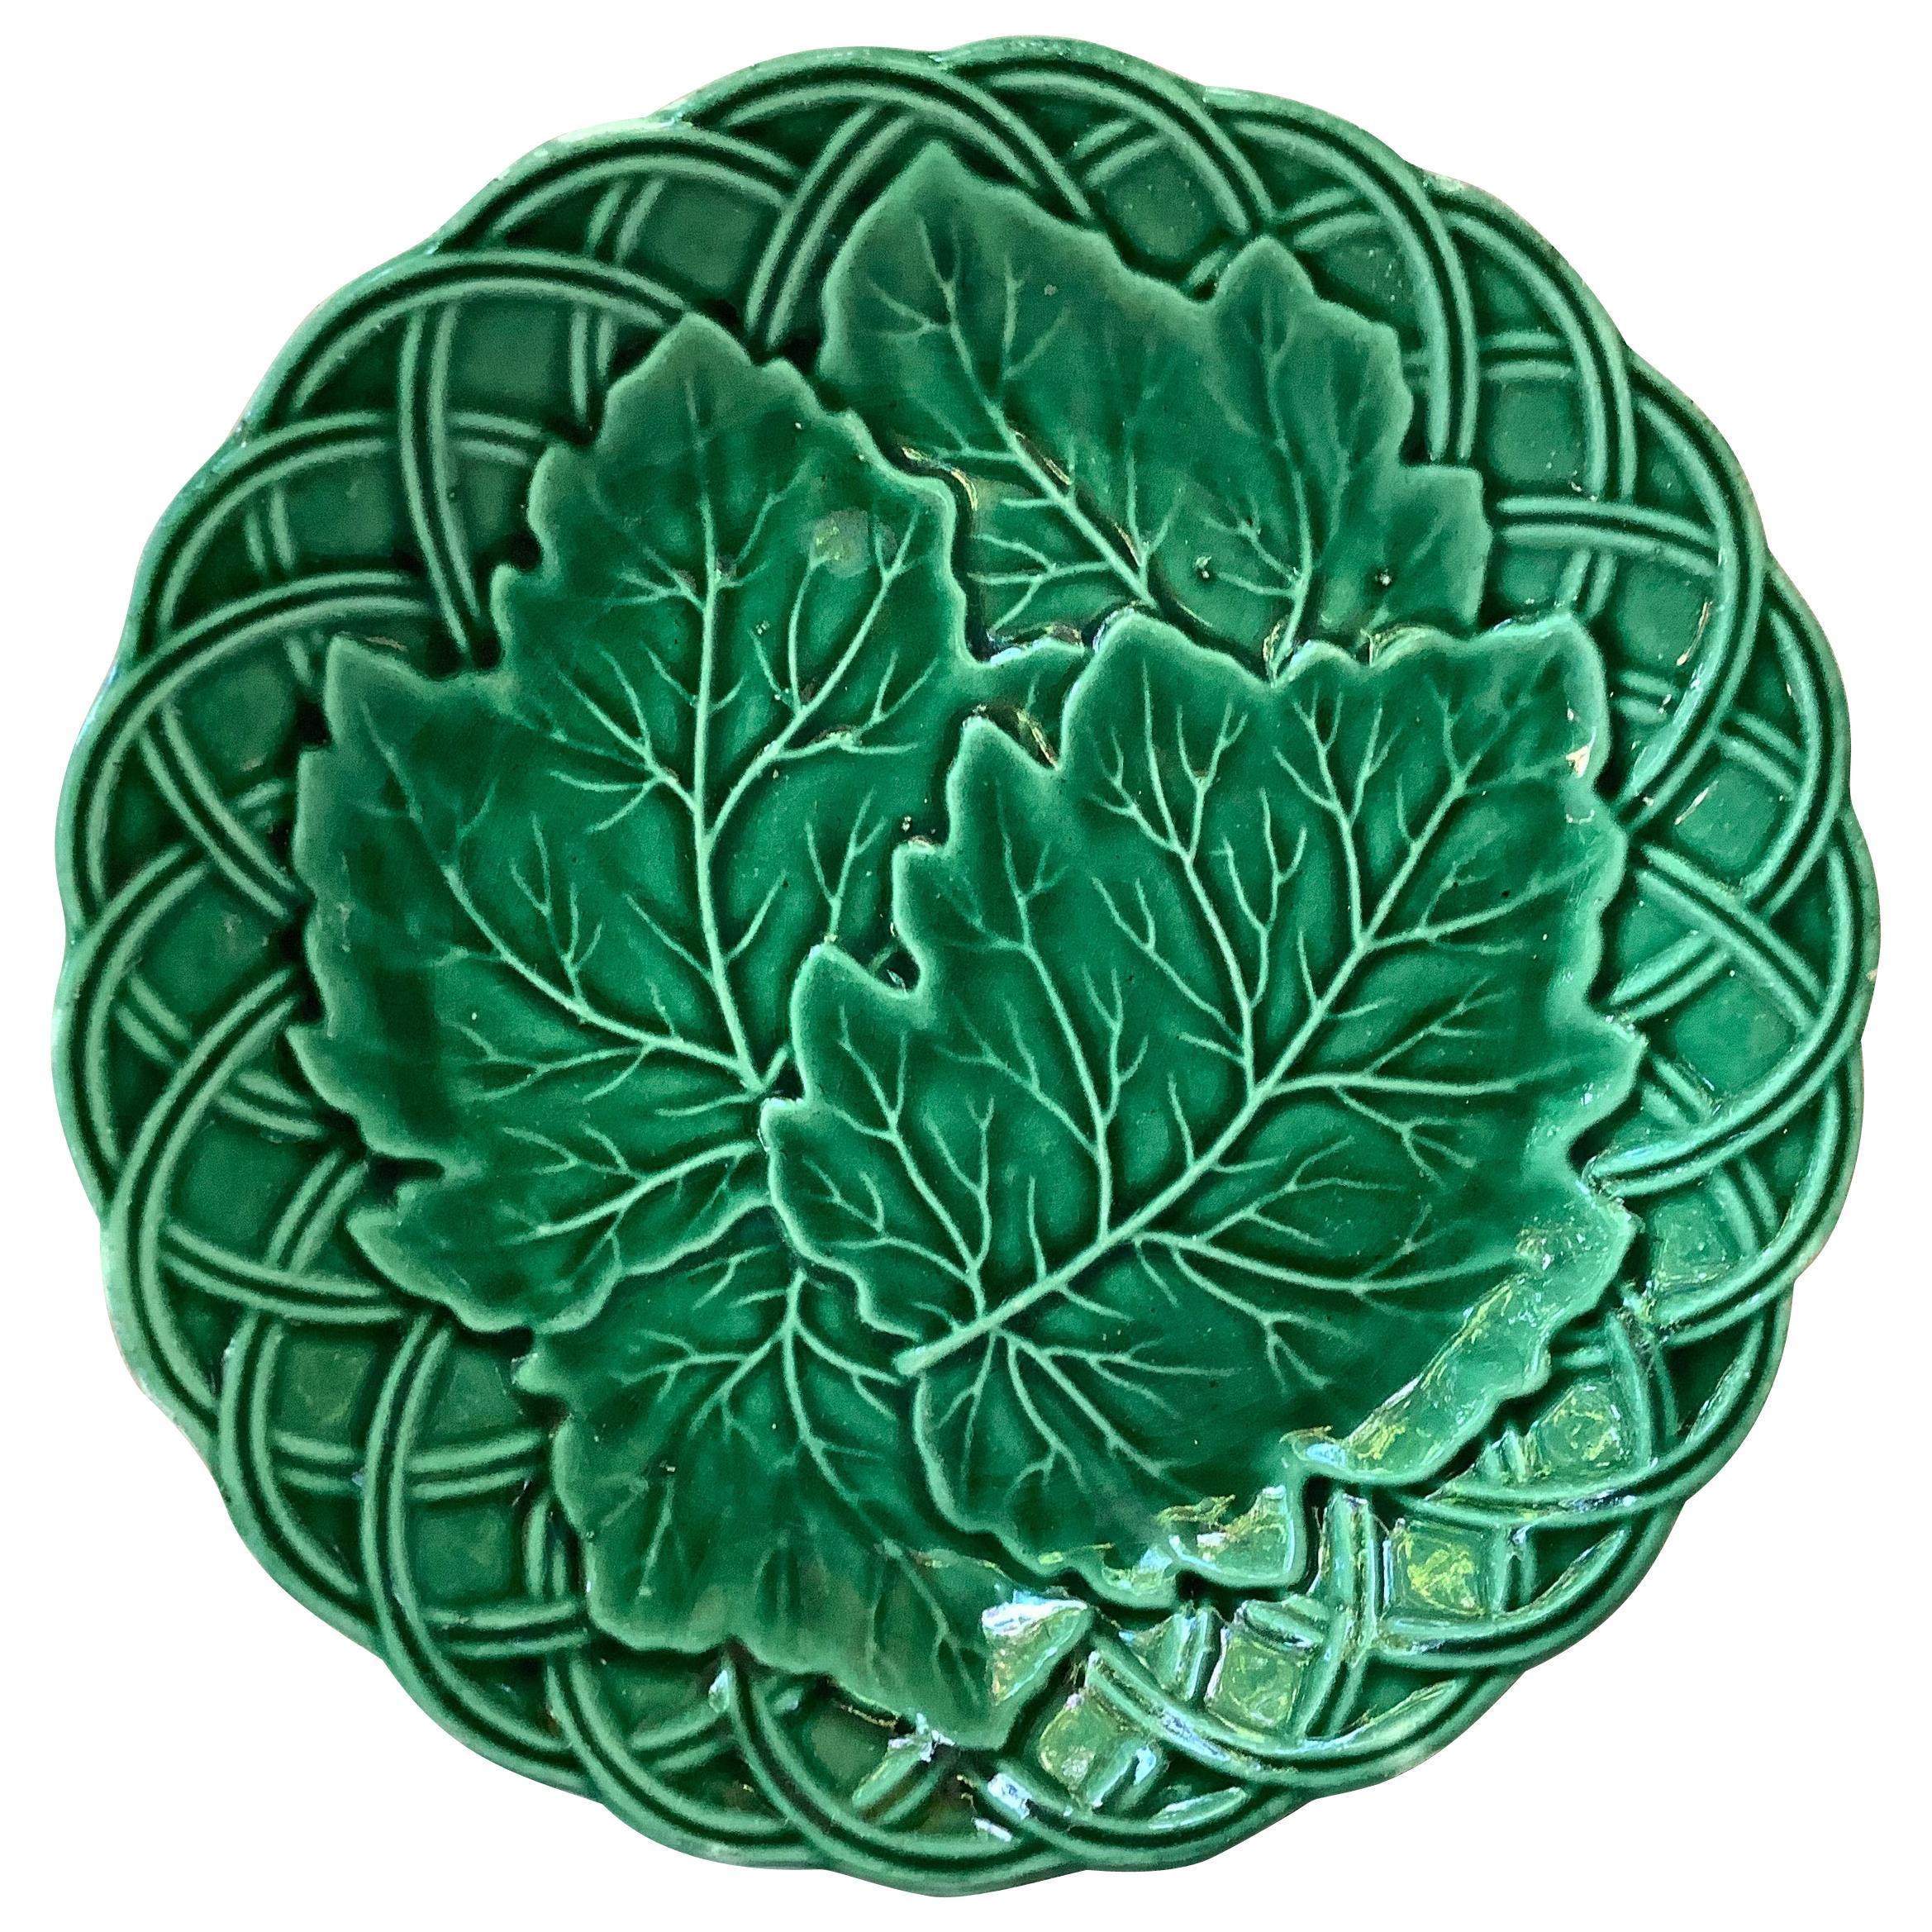 French Green Majolica Leaves Plate, circa 1880